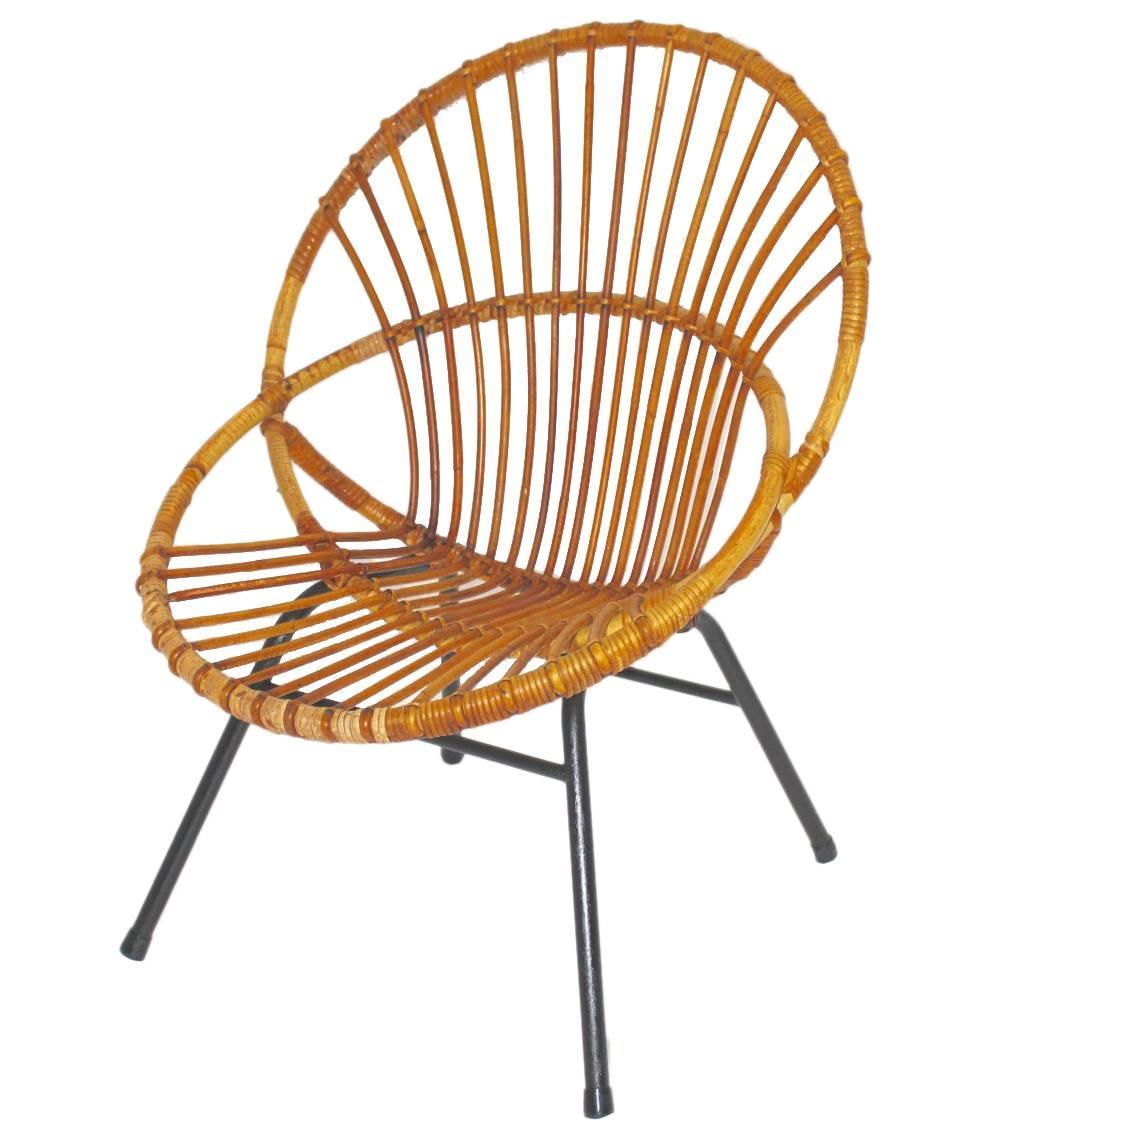 Mid Century Modern Vintage Rattan Chair Patio Rohe Noordwolde Netherlands, 1960s